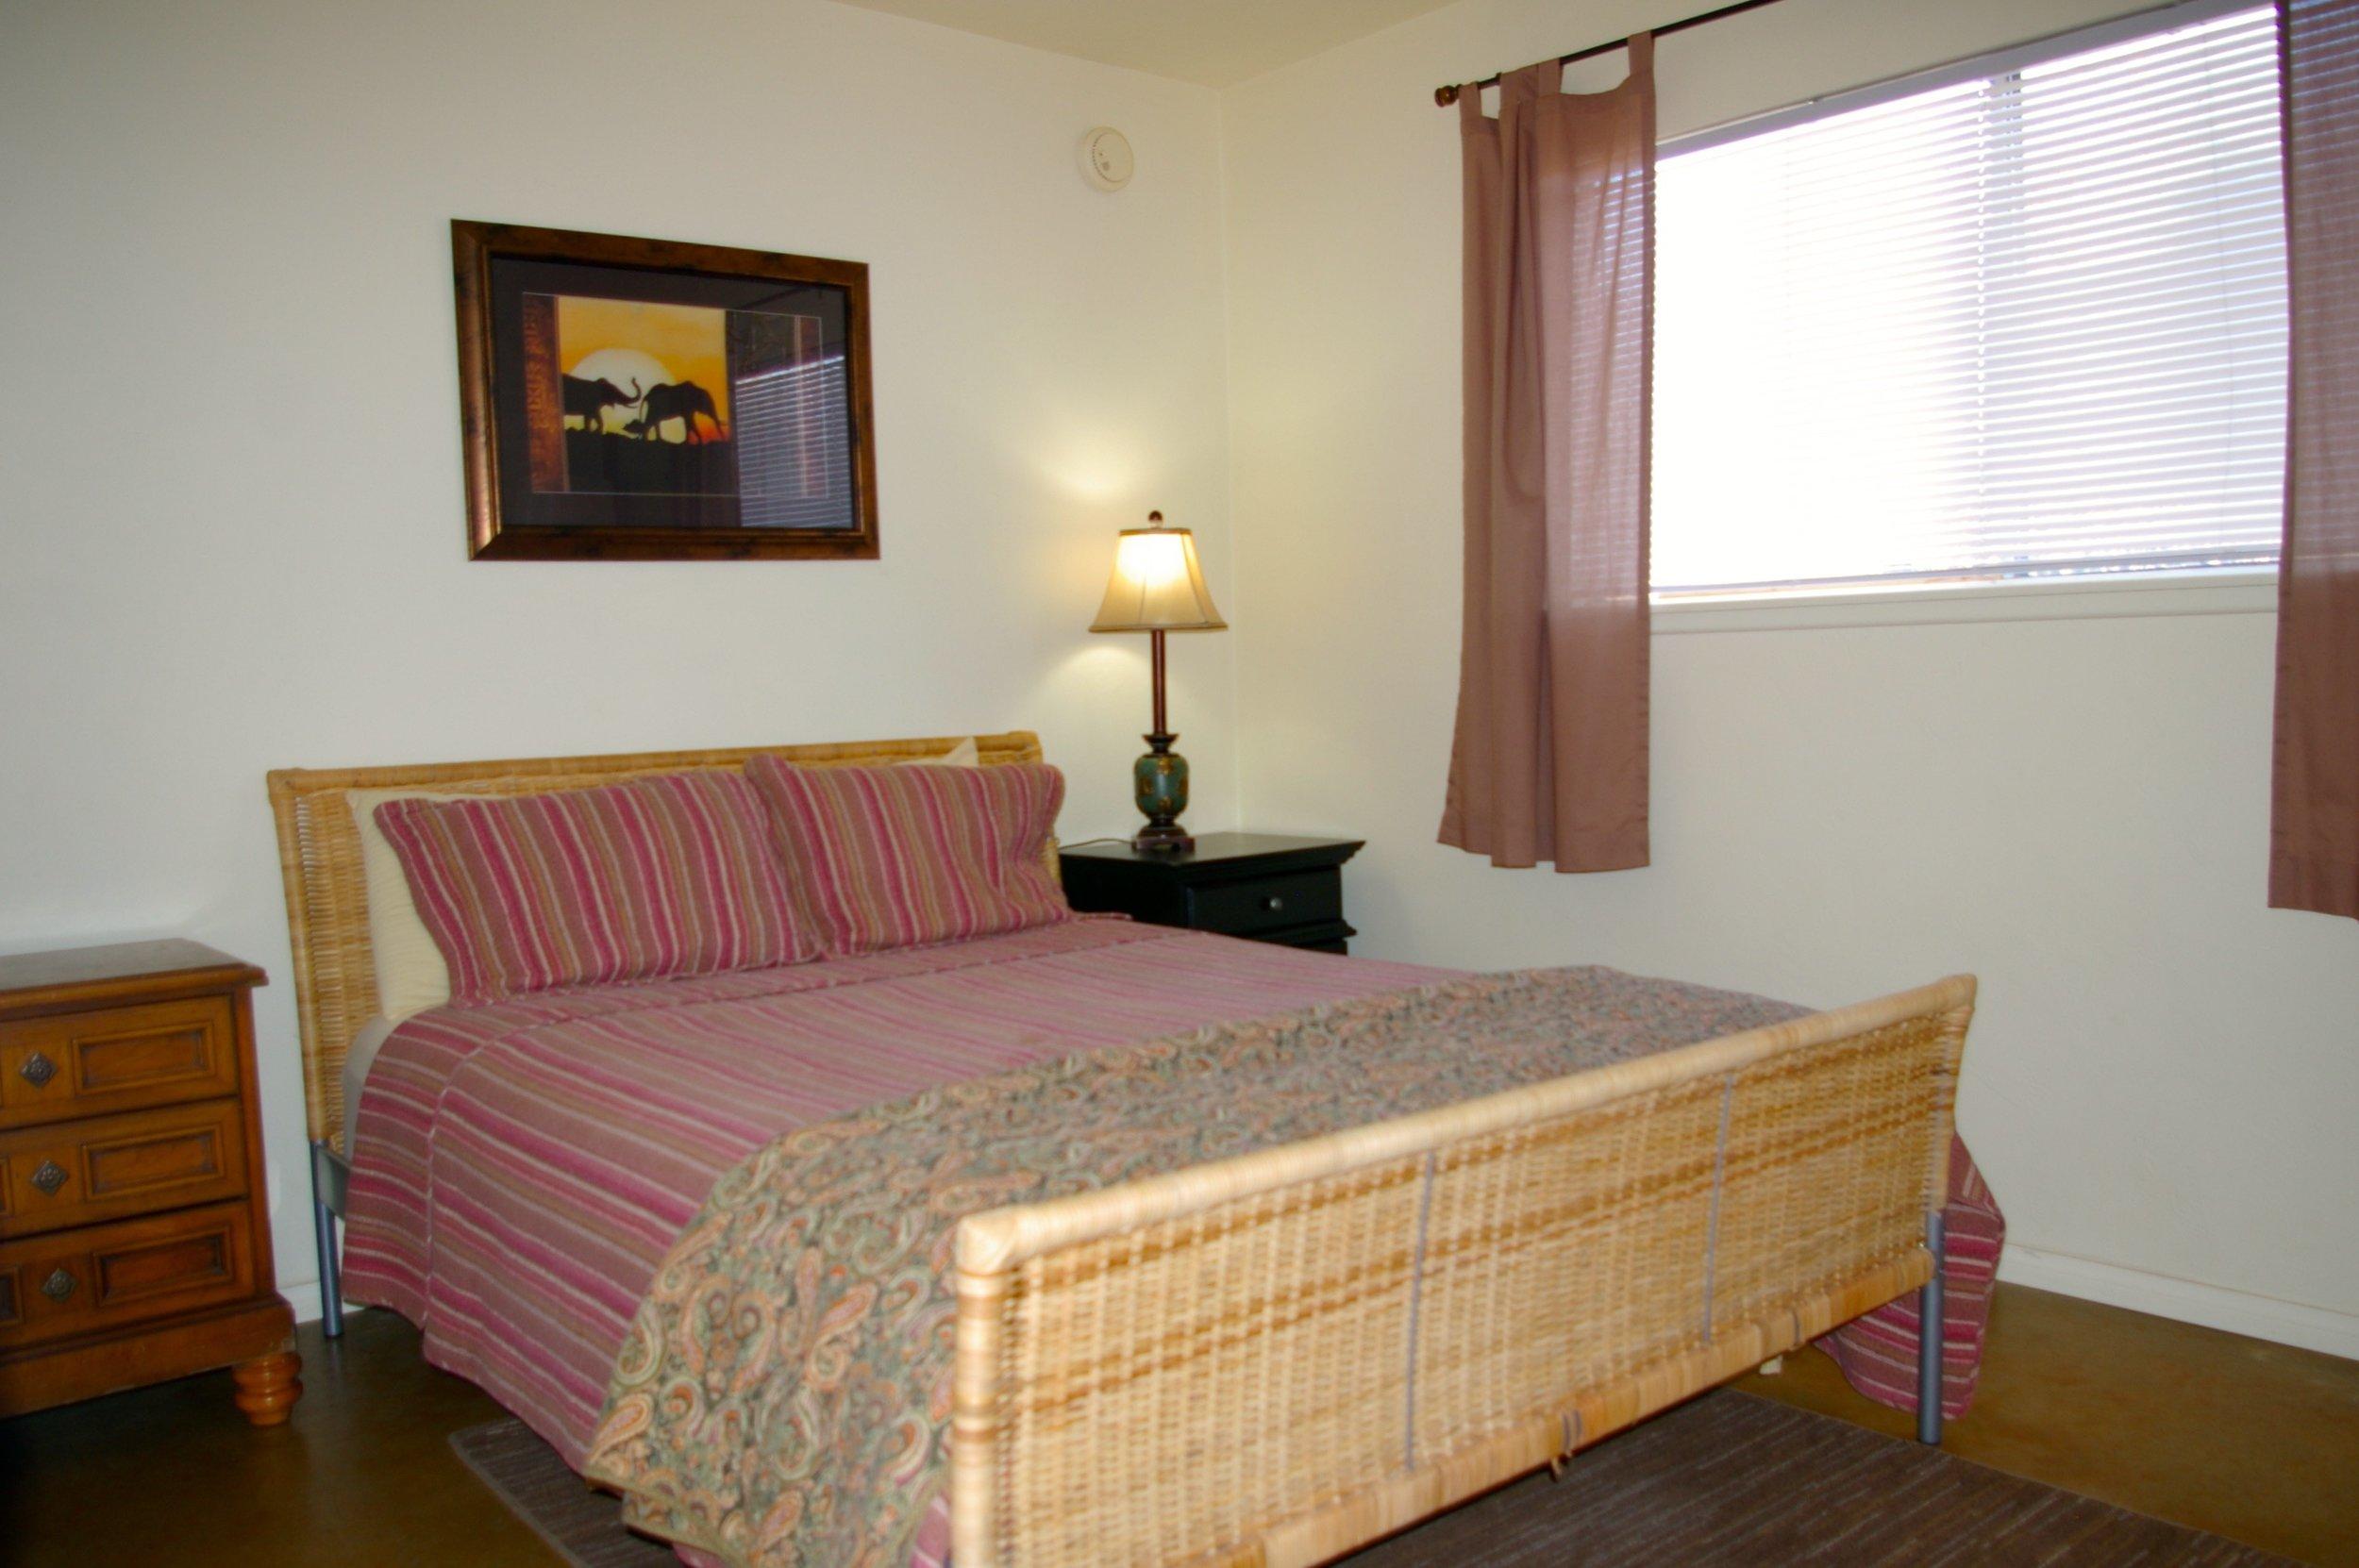 Rent29 Cactus West Guest Room